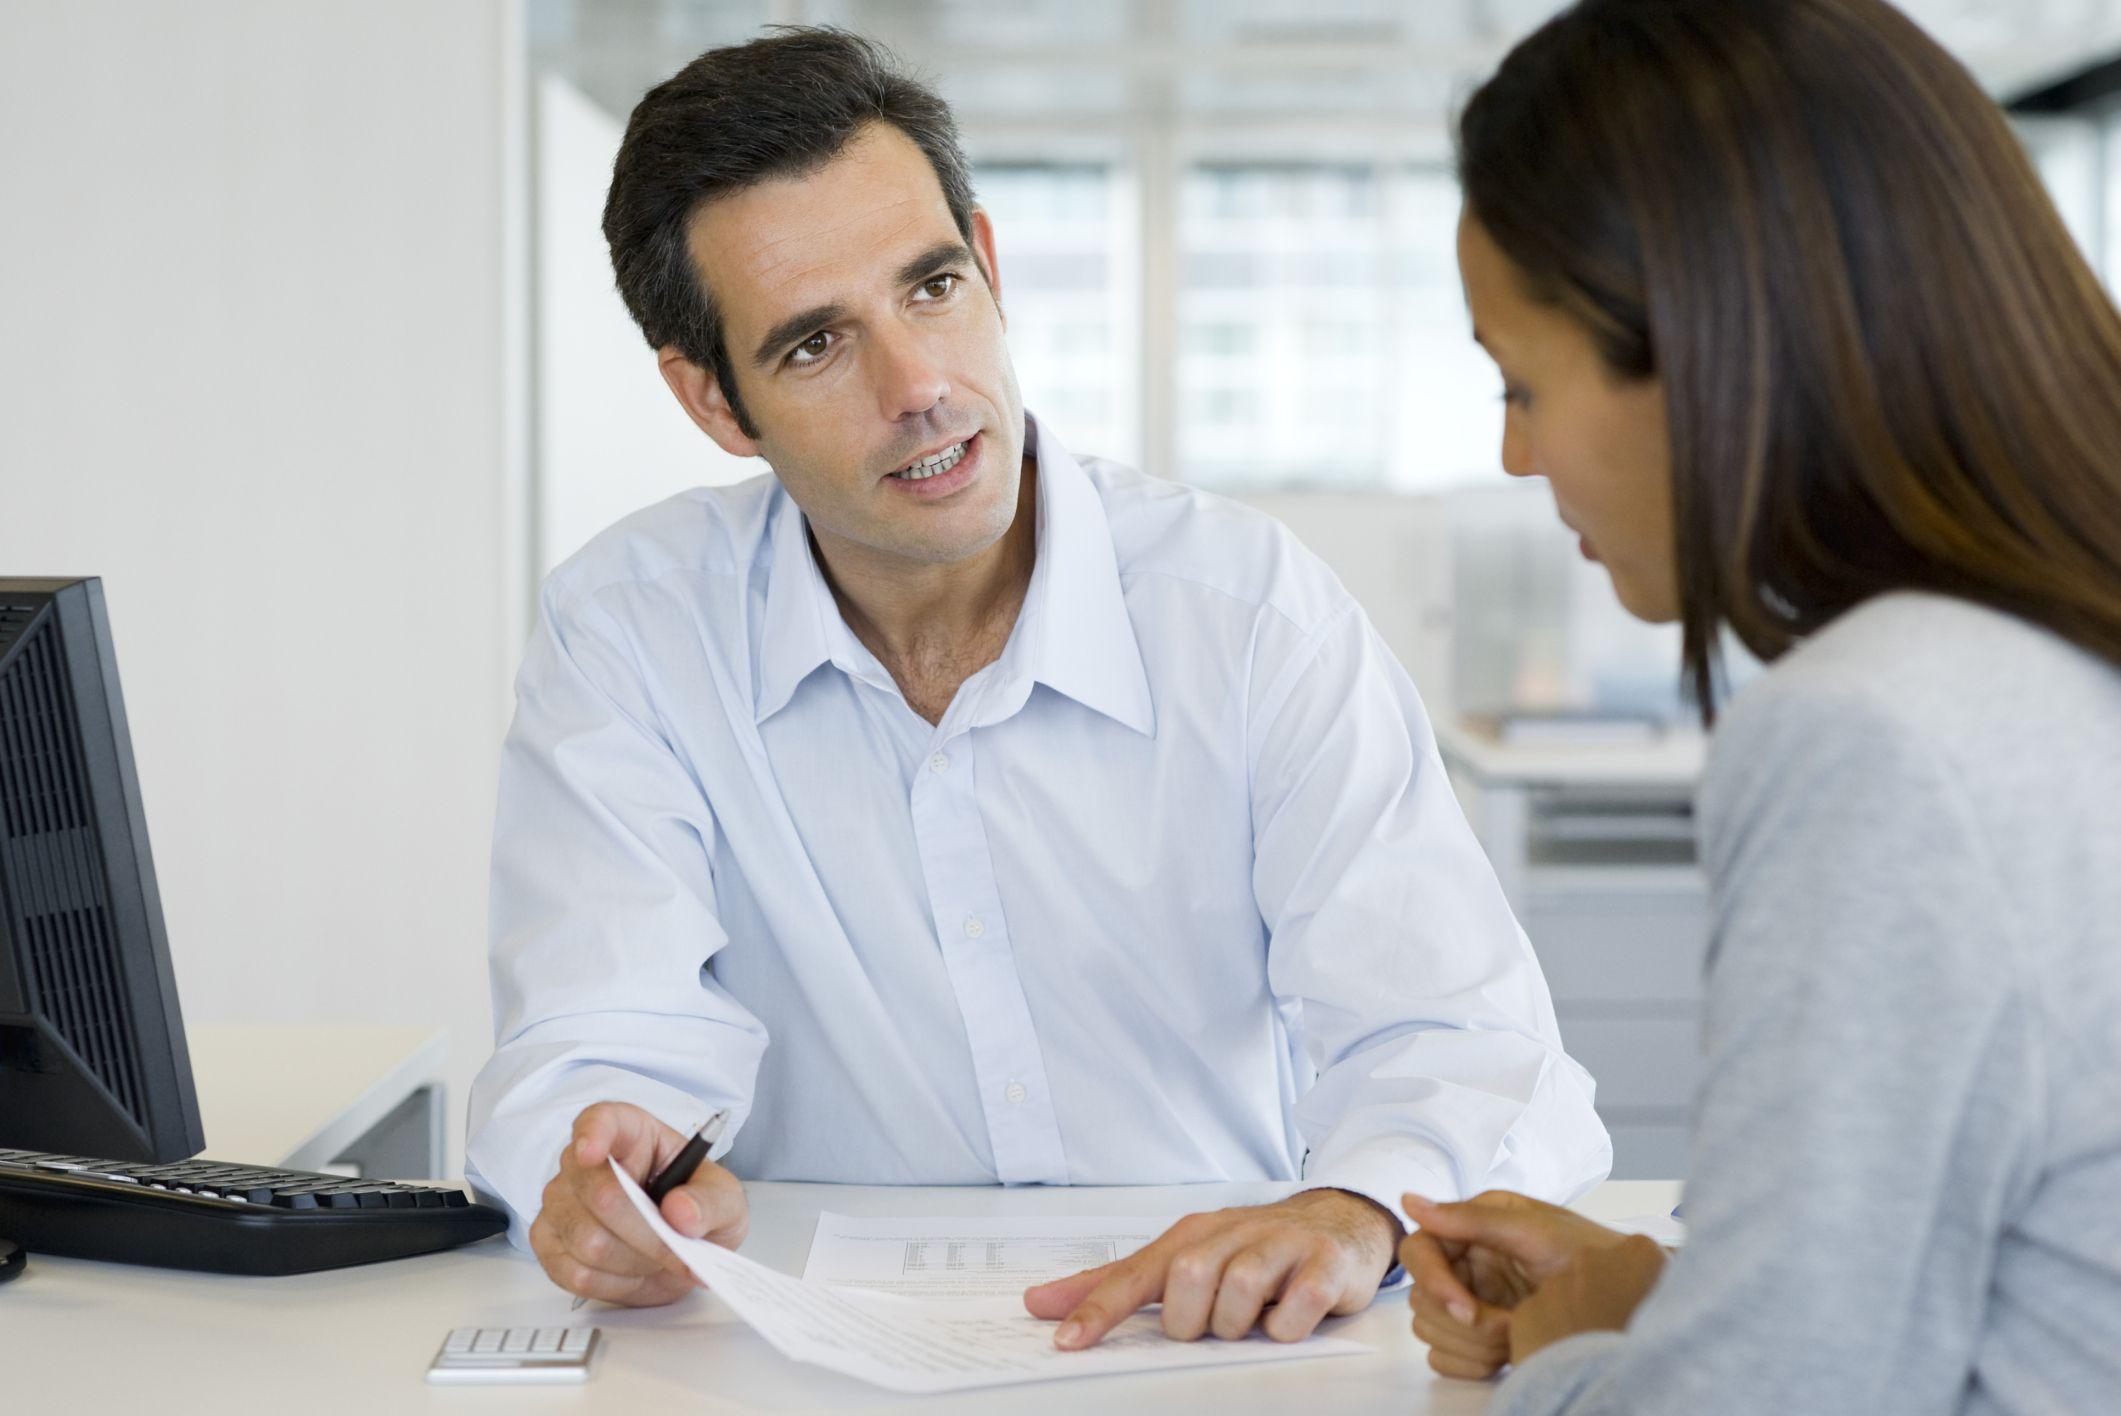 finra licensed financial adviser - HD2000×1125